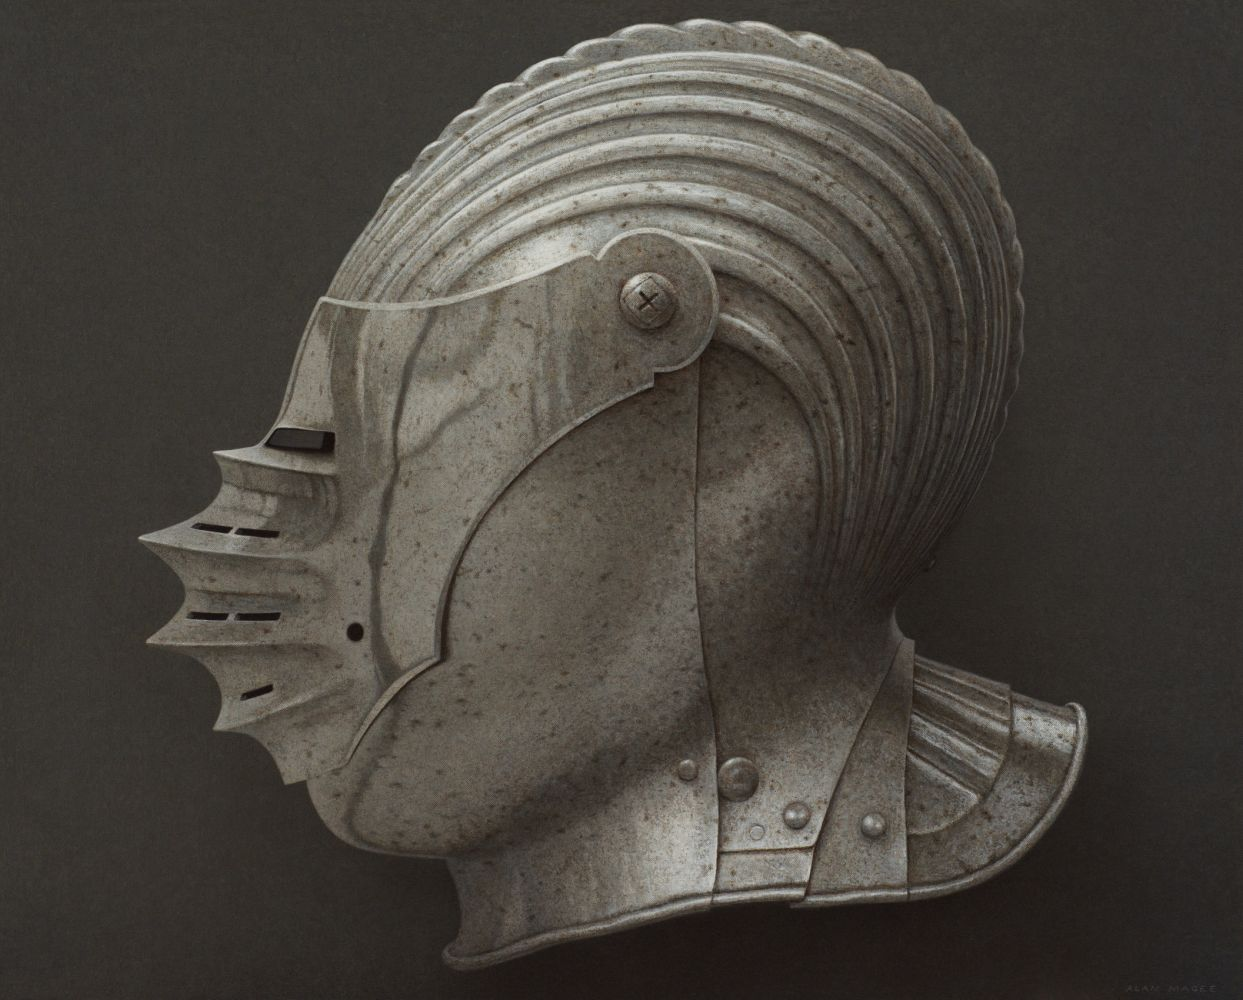 Alan Magee, Helmet IV, 2019, acrylic on canvas, 40 1/8 x 50 1/8 inches